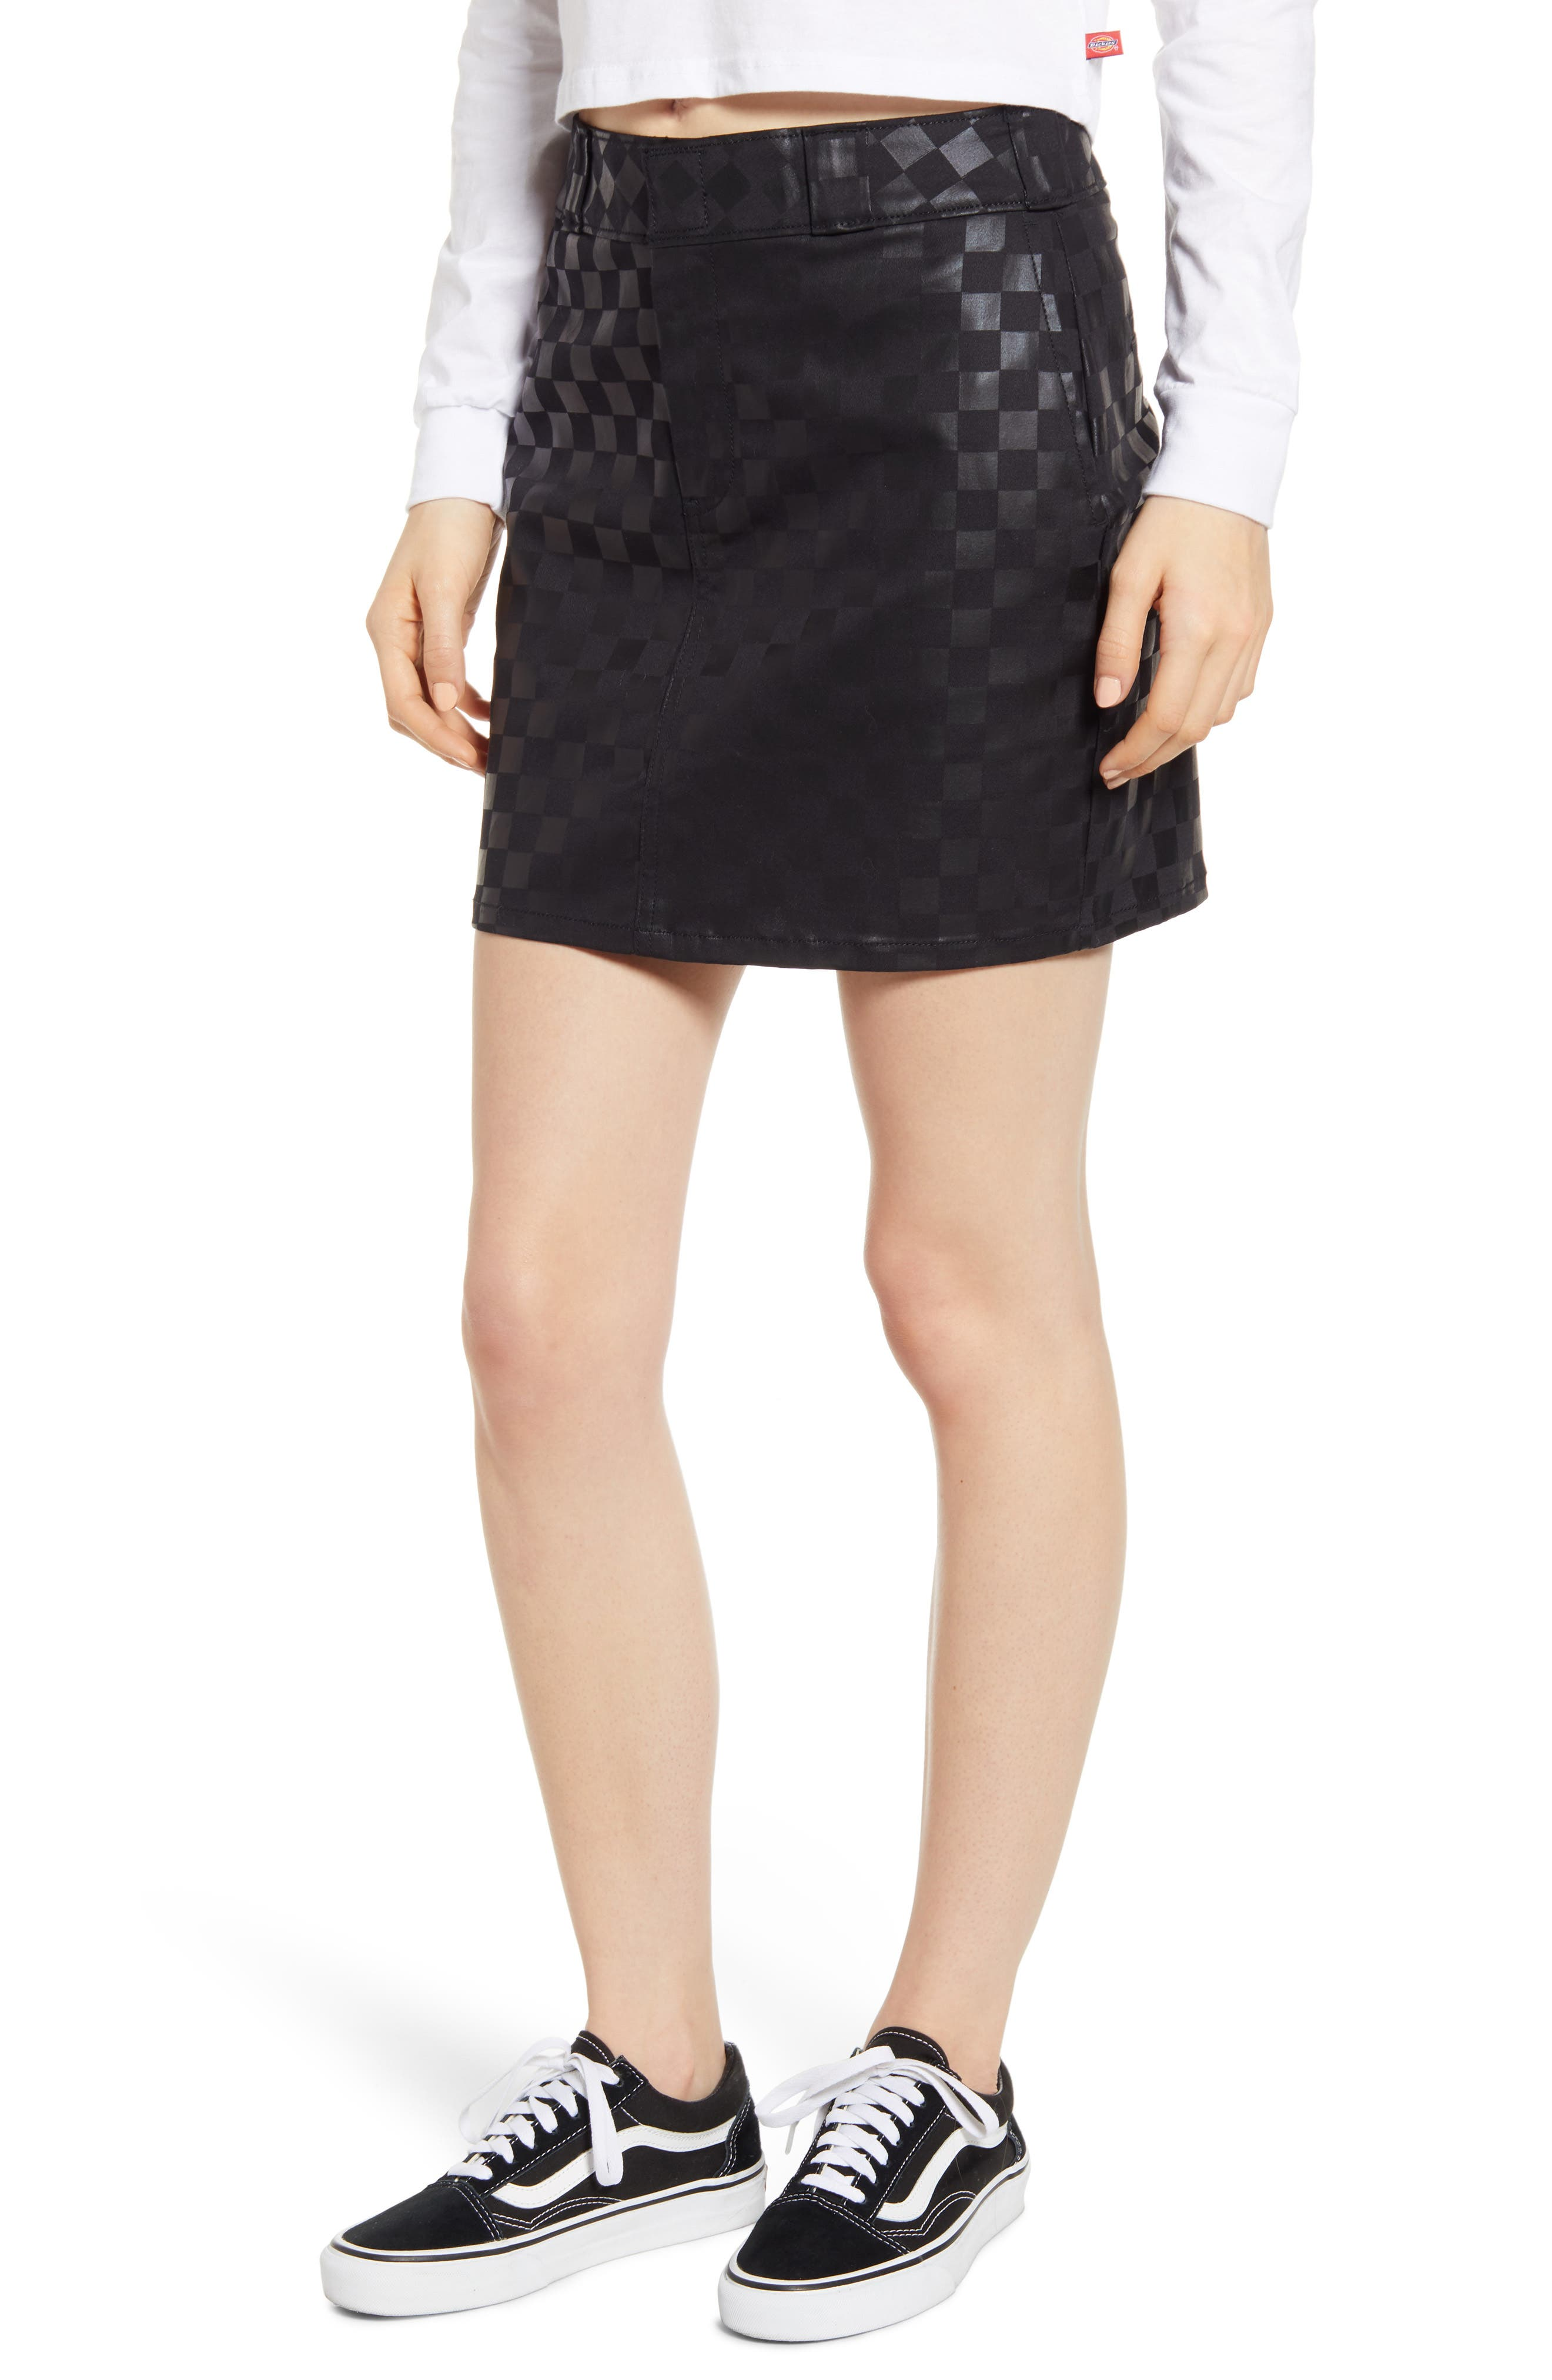 Dickies Check Print Work Skirt, Black